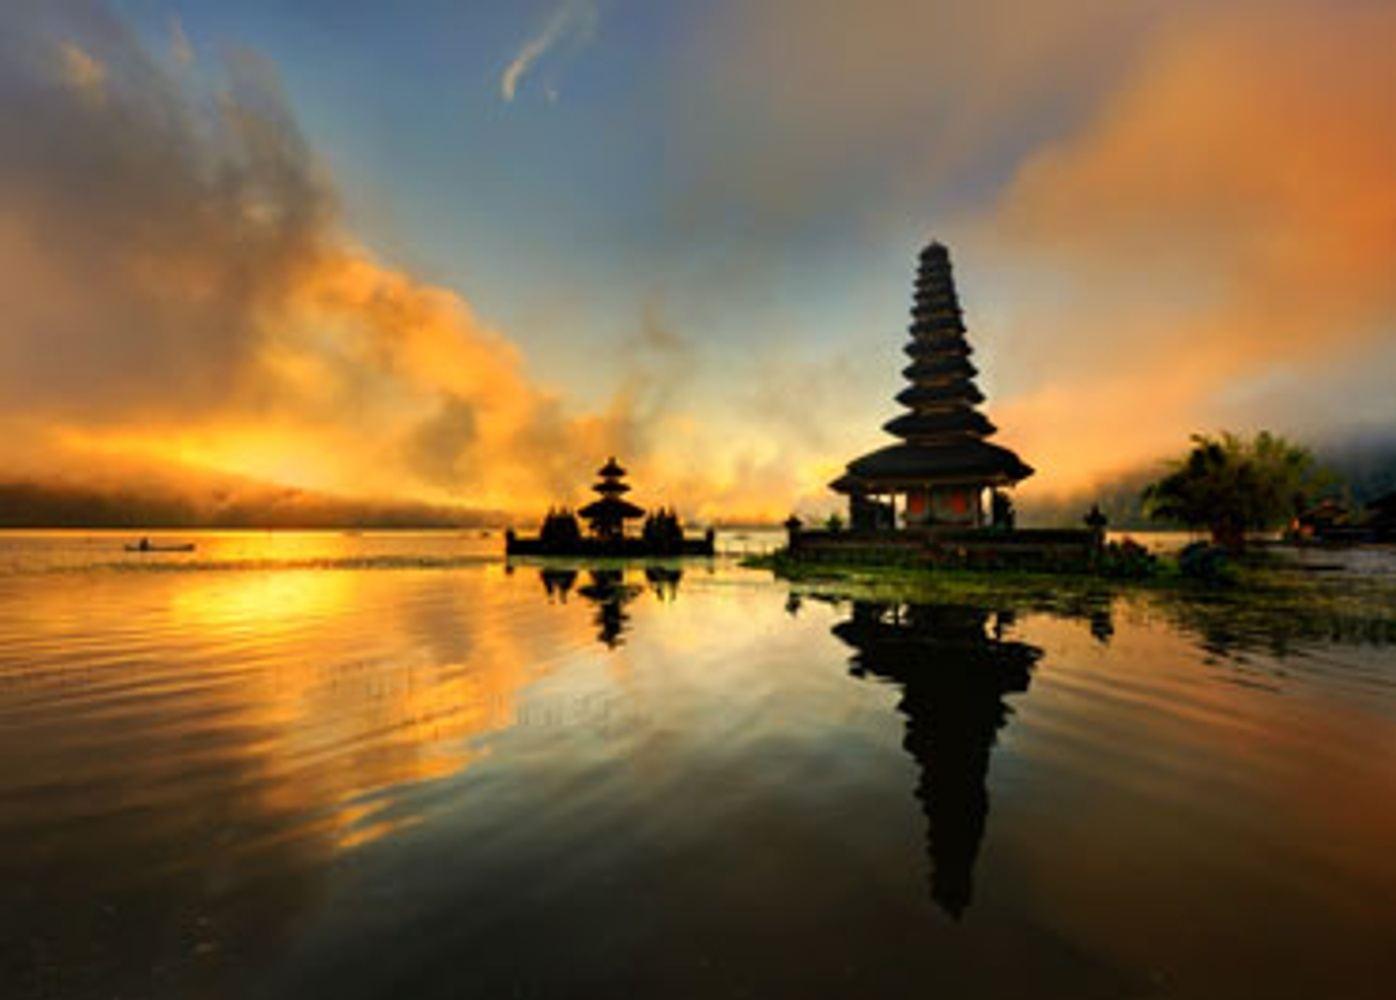 The Grand Bali trip